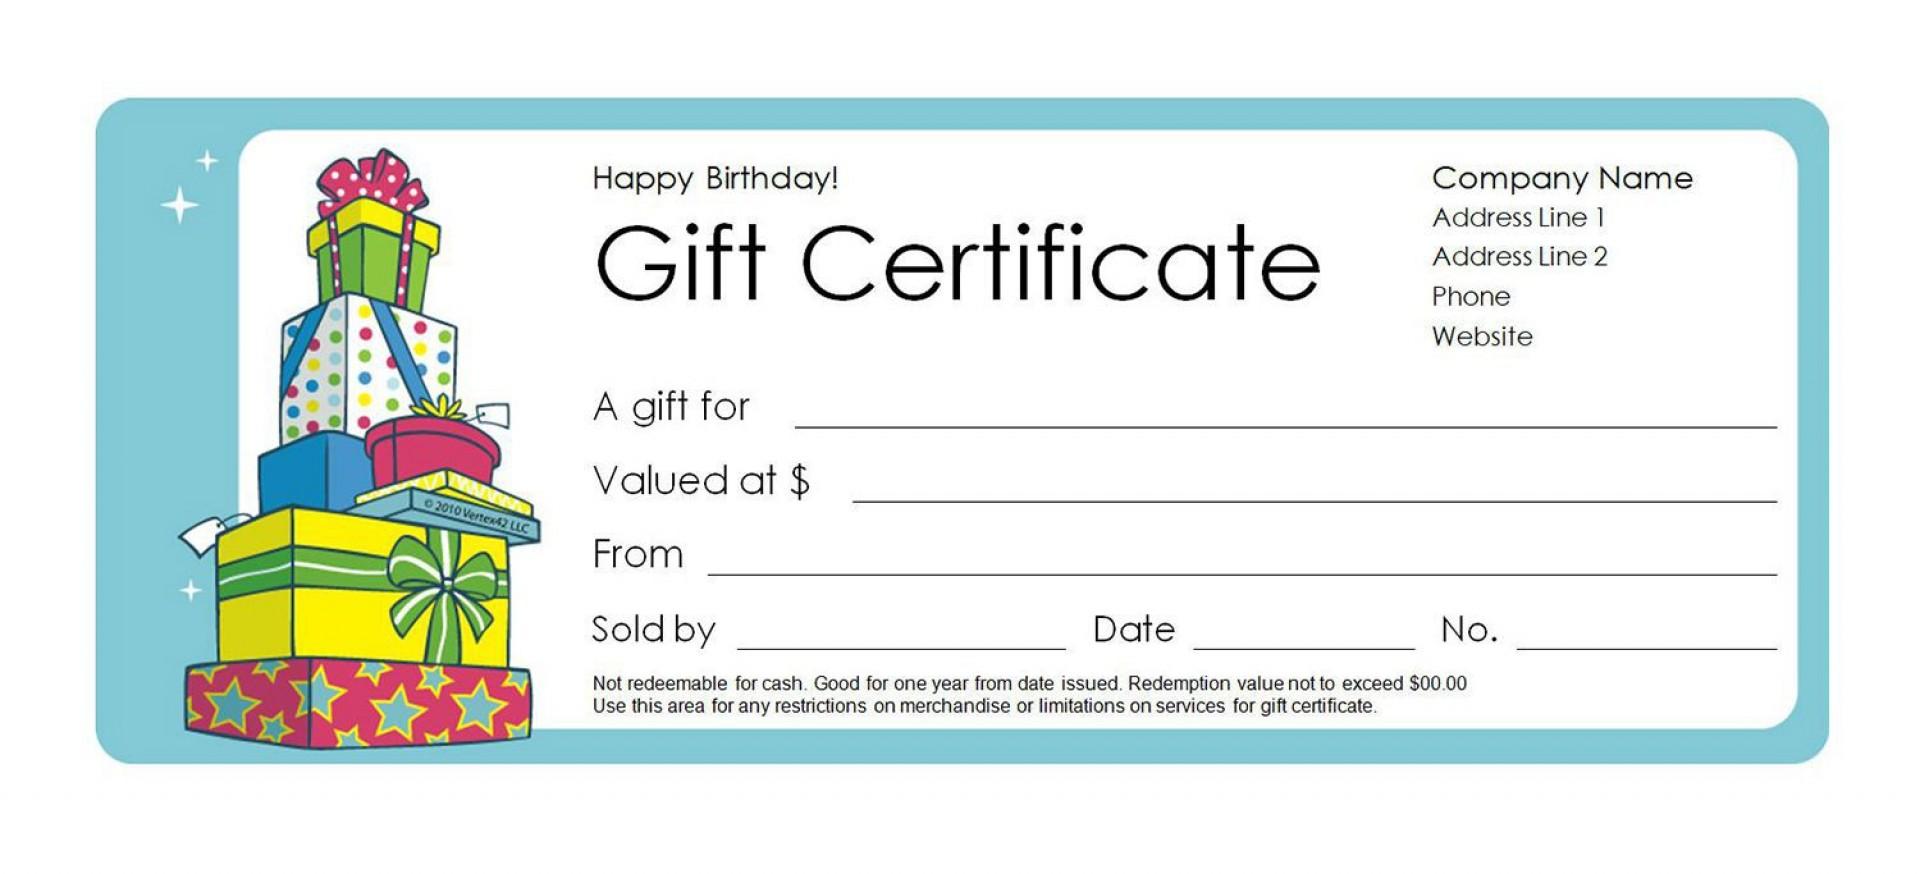 006 Singular Gift Card Template Word Photo  Restaurant Free Microsoft1920